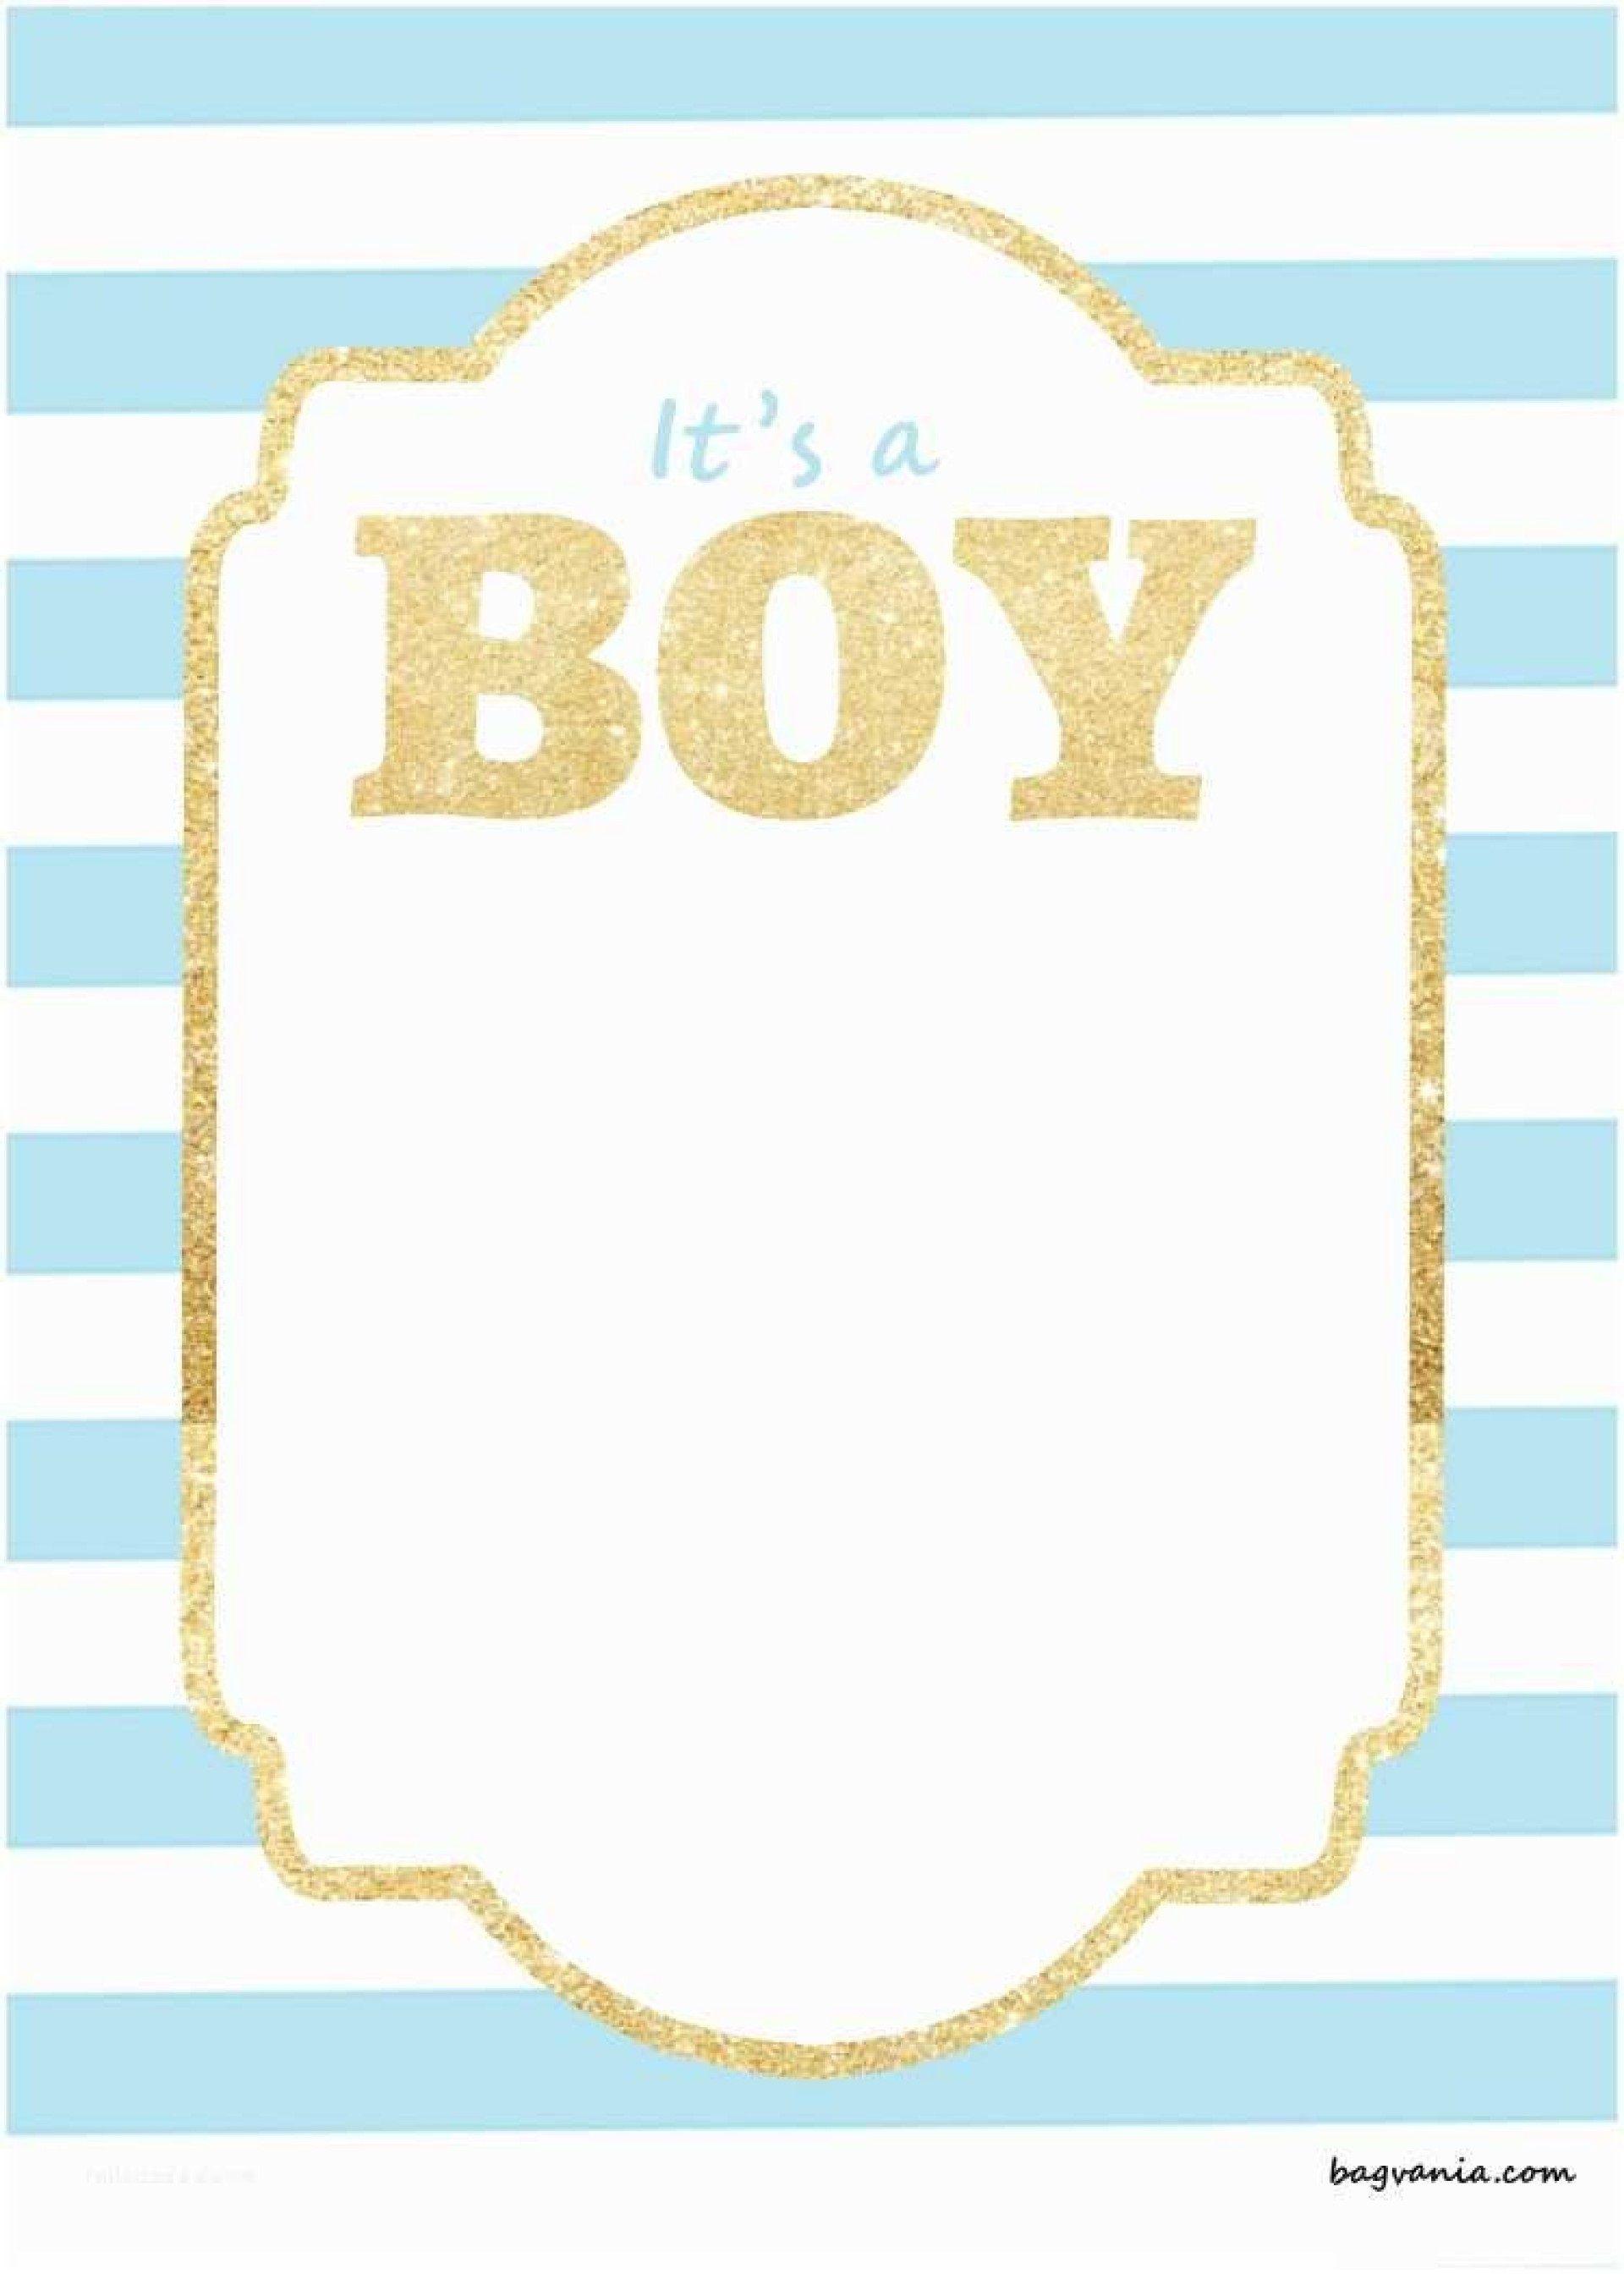 009 Stunning Free Baby Shower Invitation Template For Boy Idea Full